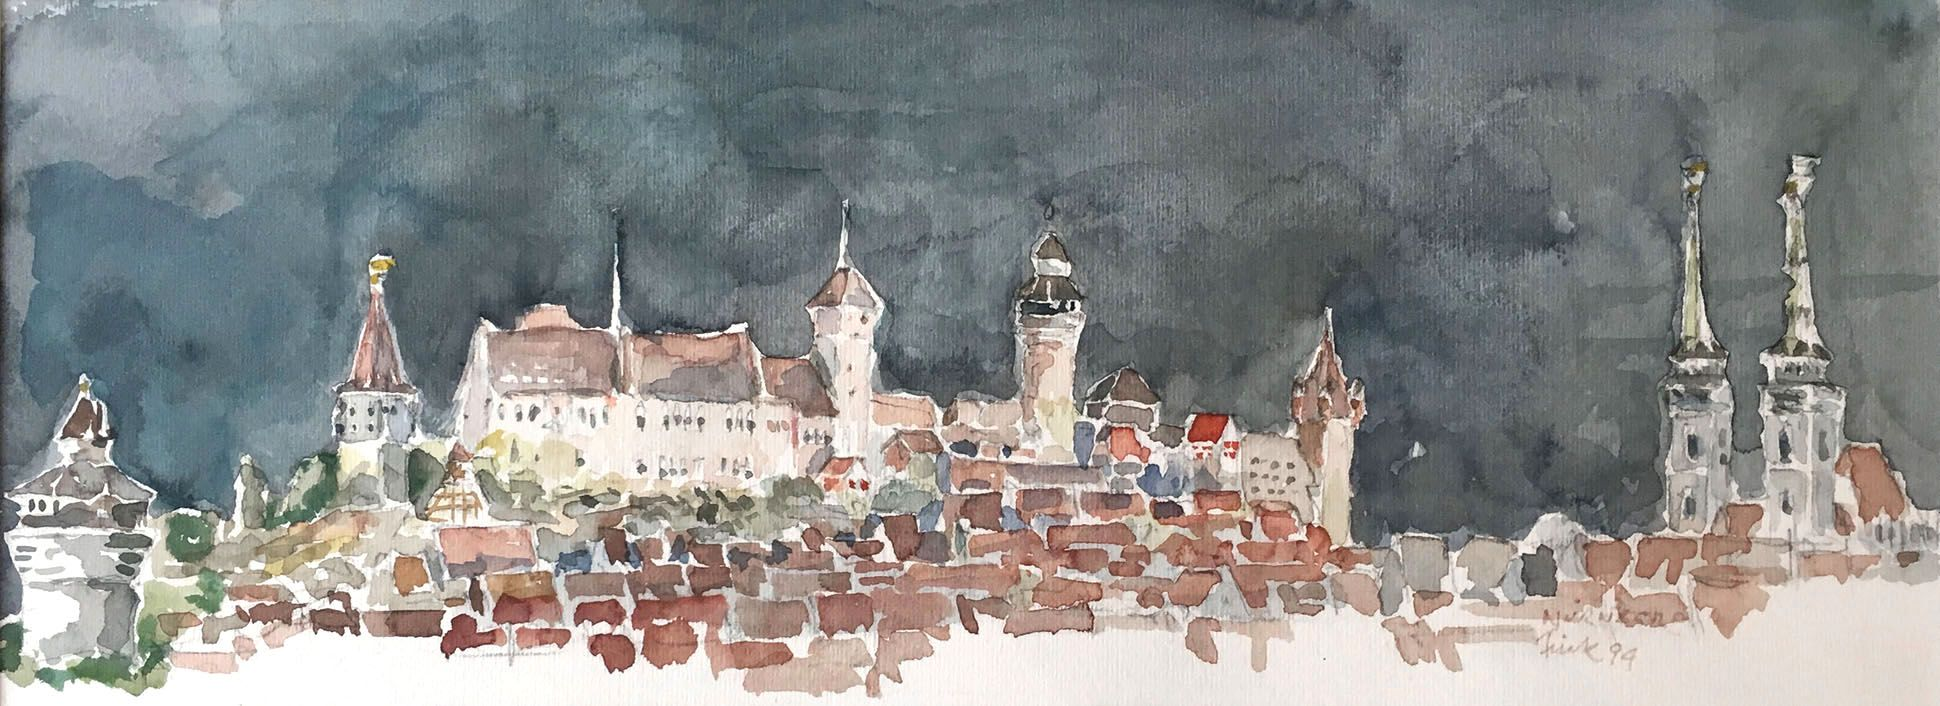 Nuremberg by night City silhouette from Neutorturm to Sebaldus Church